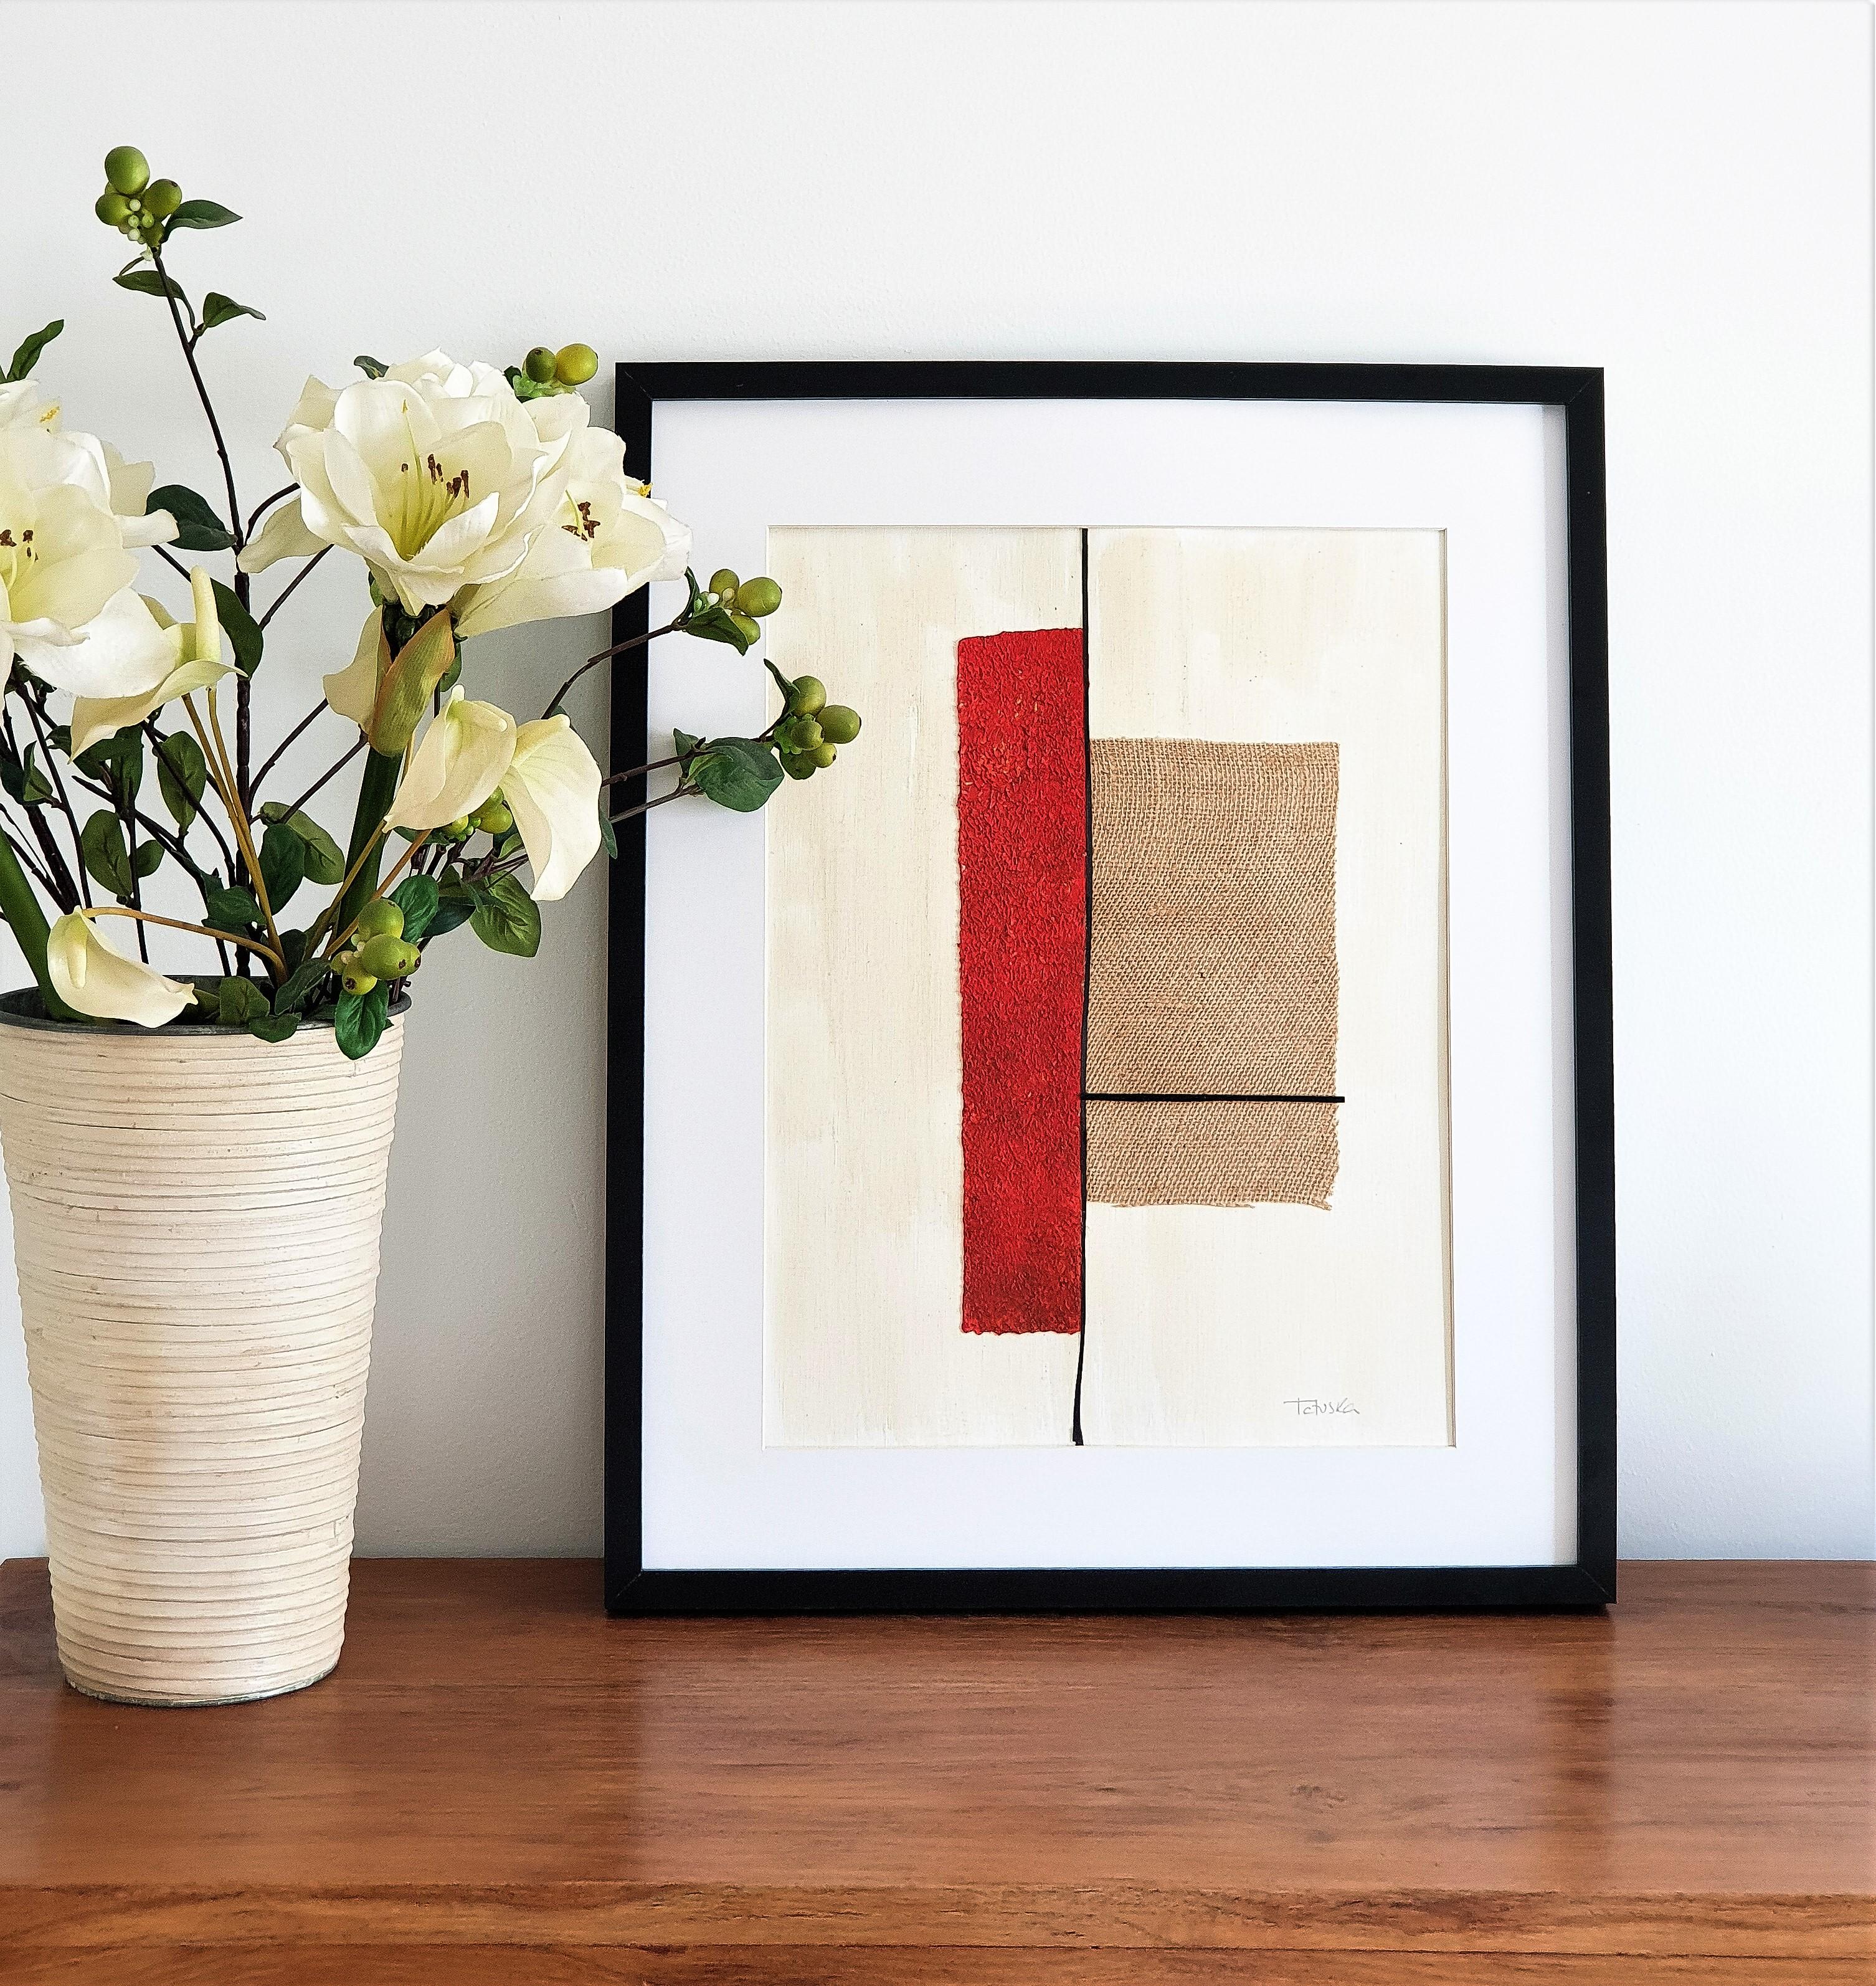 """Slightly different"", cuadro abstracto de Tatuska"